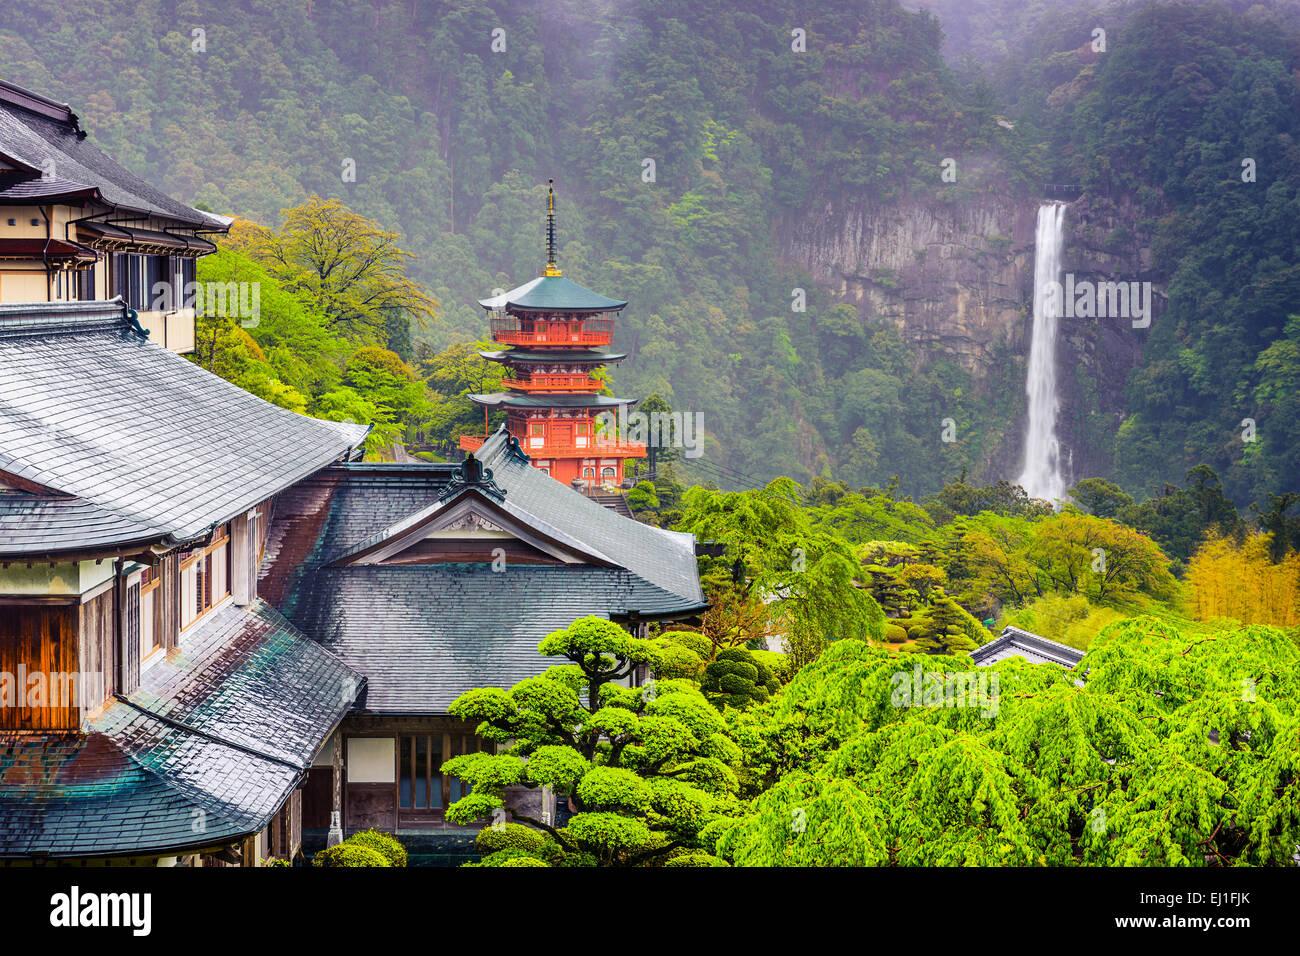 Nachi, Japan hillside temples with Seiganto-ji Pagoda and Nachi Waterfall. - Stock Image